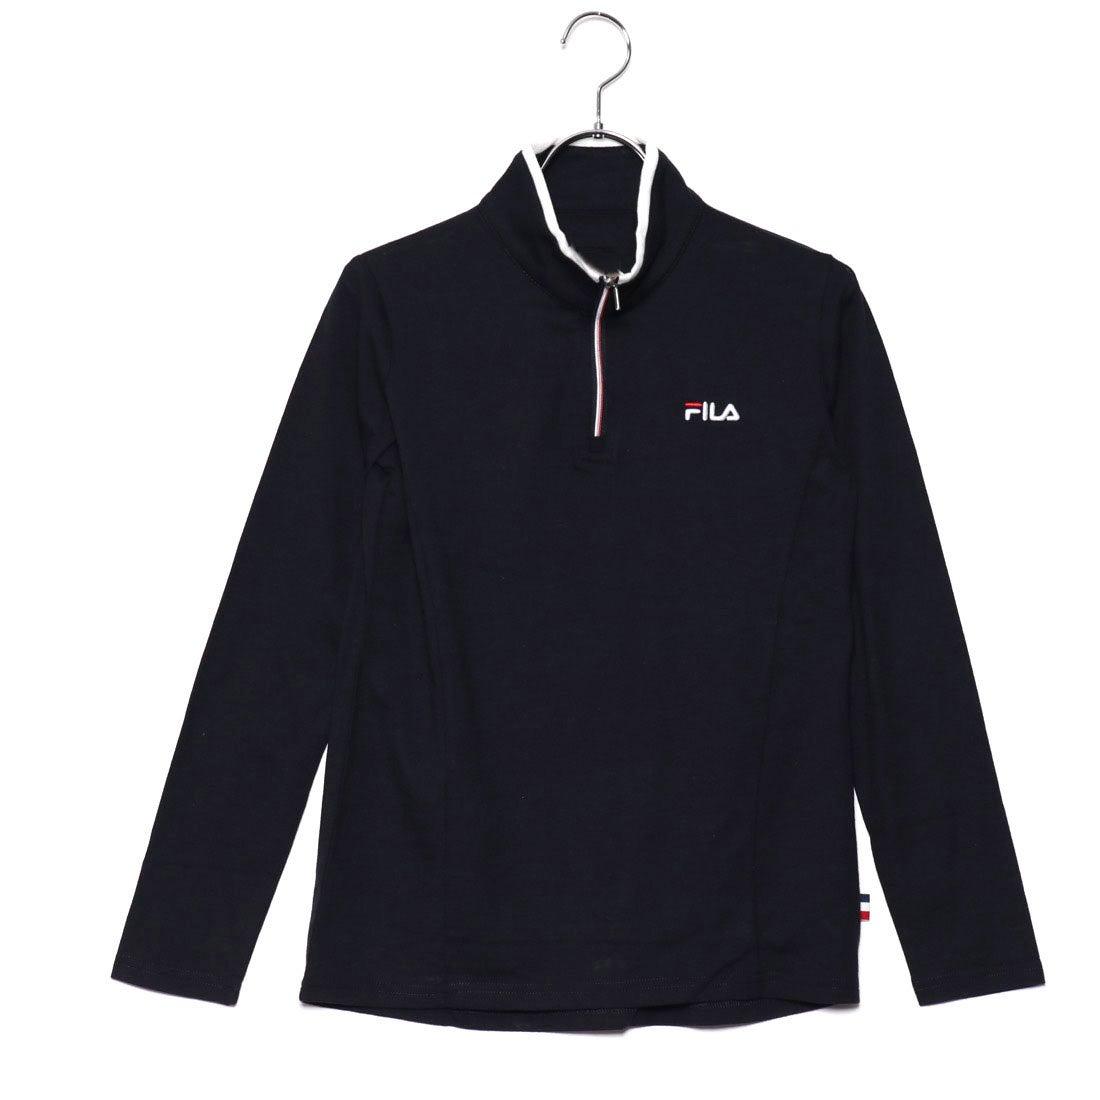 be175a08433 フィラ FILA レディース 長袖Tシャツ FL-9C25018PL -レディースファッション通販 ロコンドガールズコレクション (ロココレ)